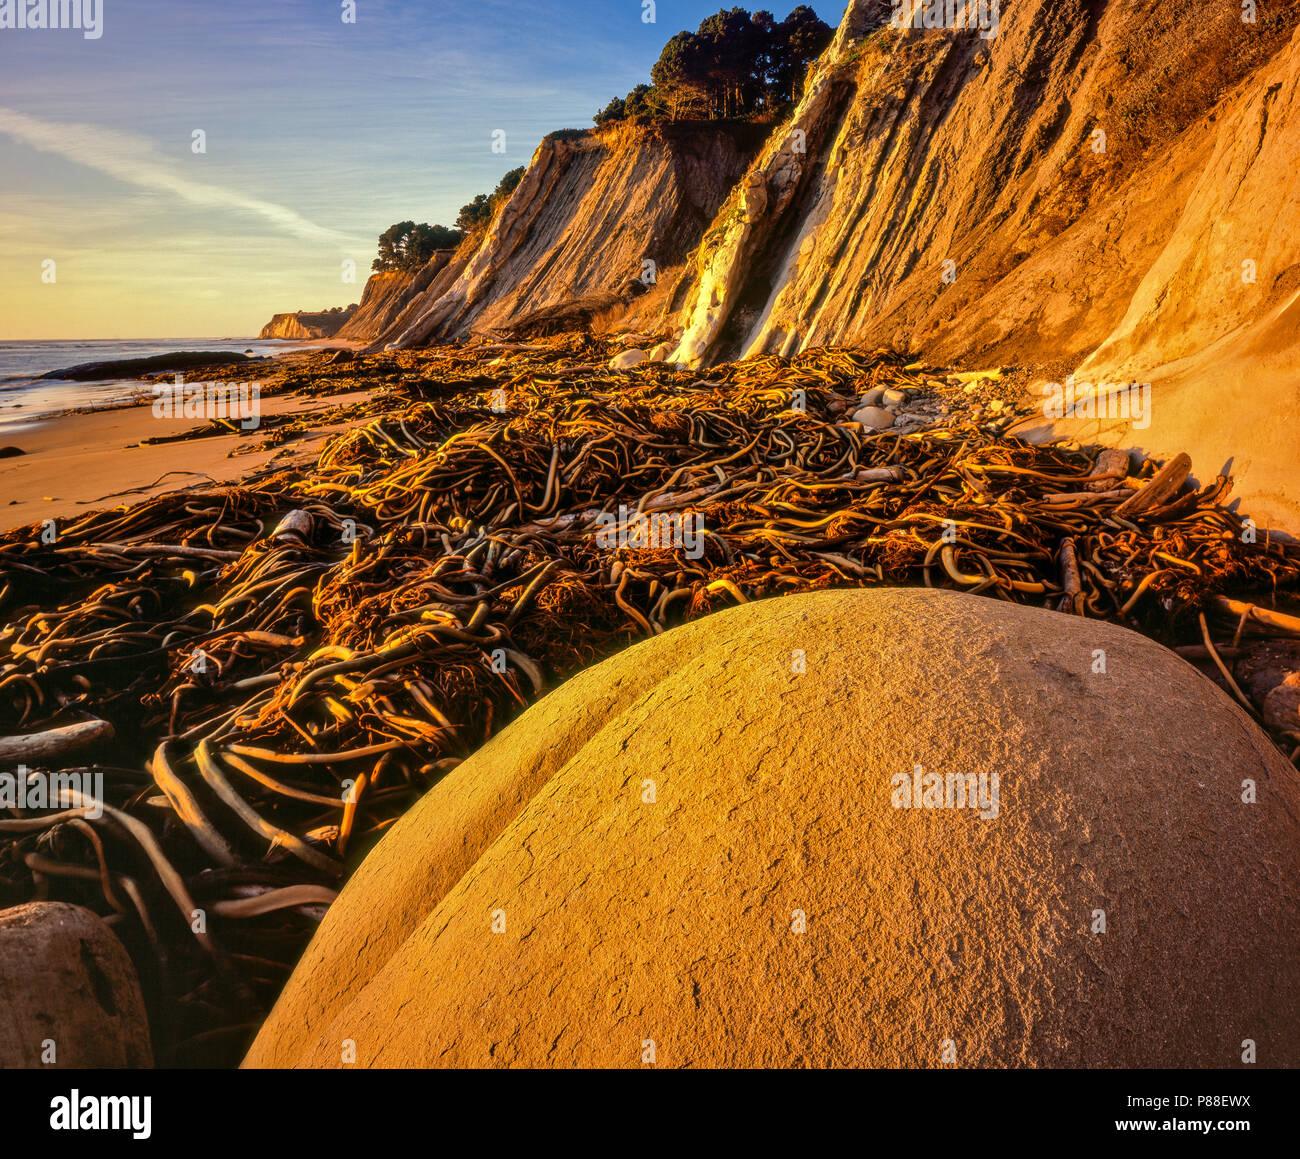 Palla da Bowling Beach, goletta Gulch State Beach, coste, Mendocino County, California Immagini Stock